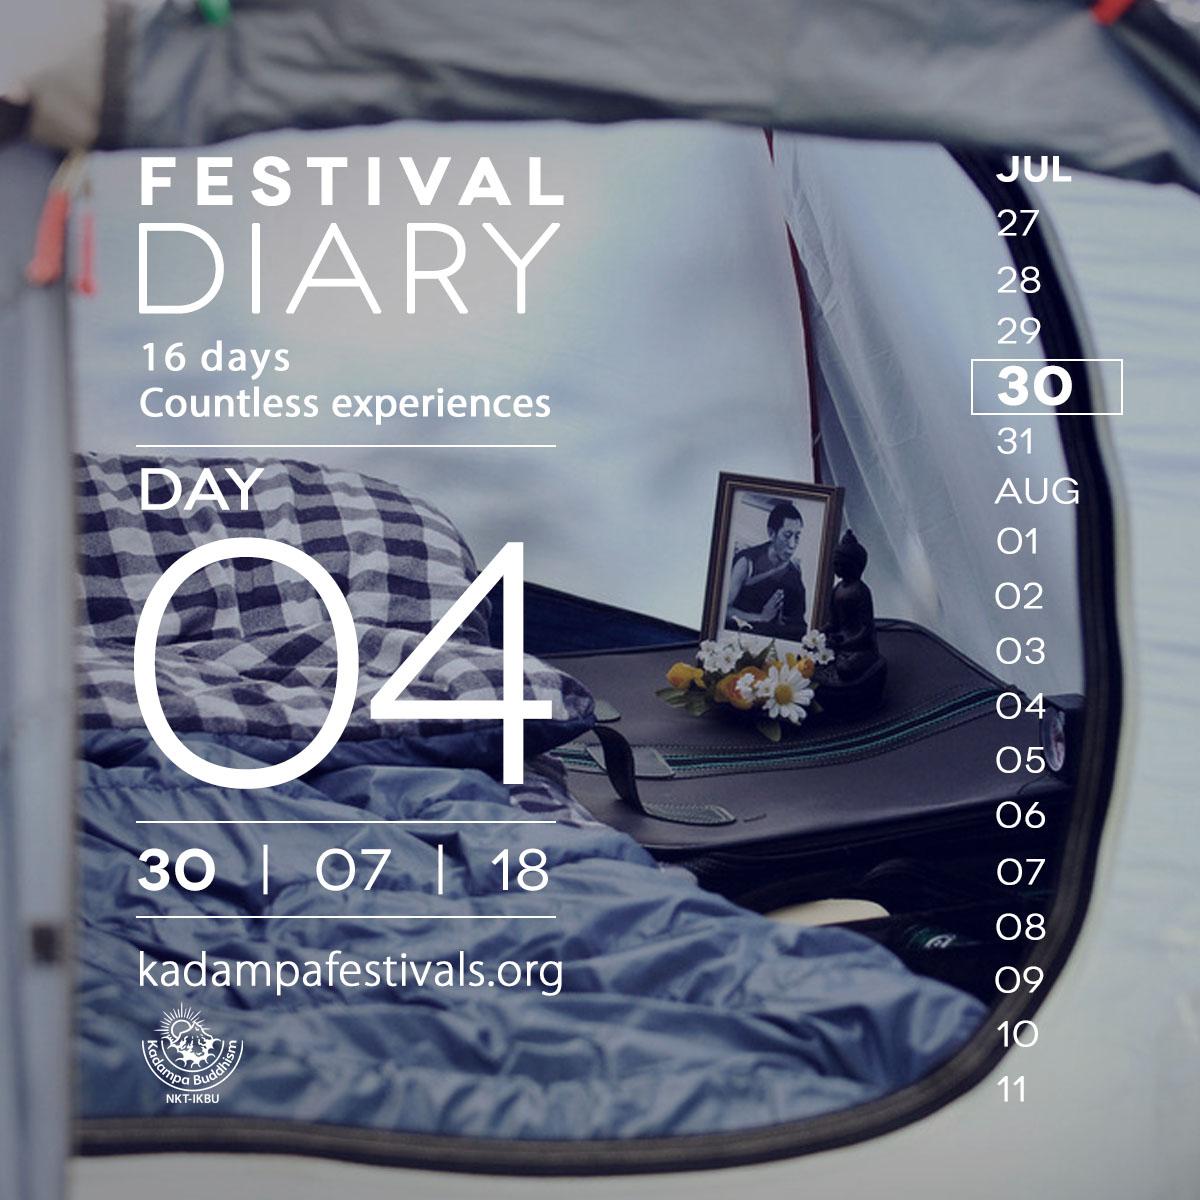 2018-07-26-festival diary-04-m